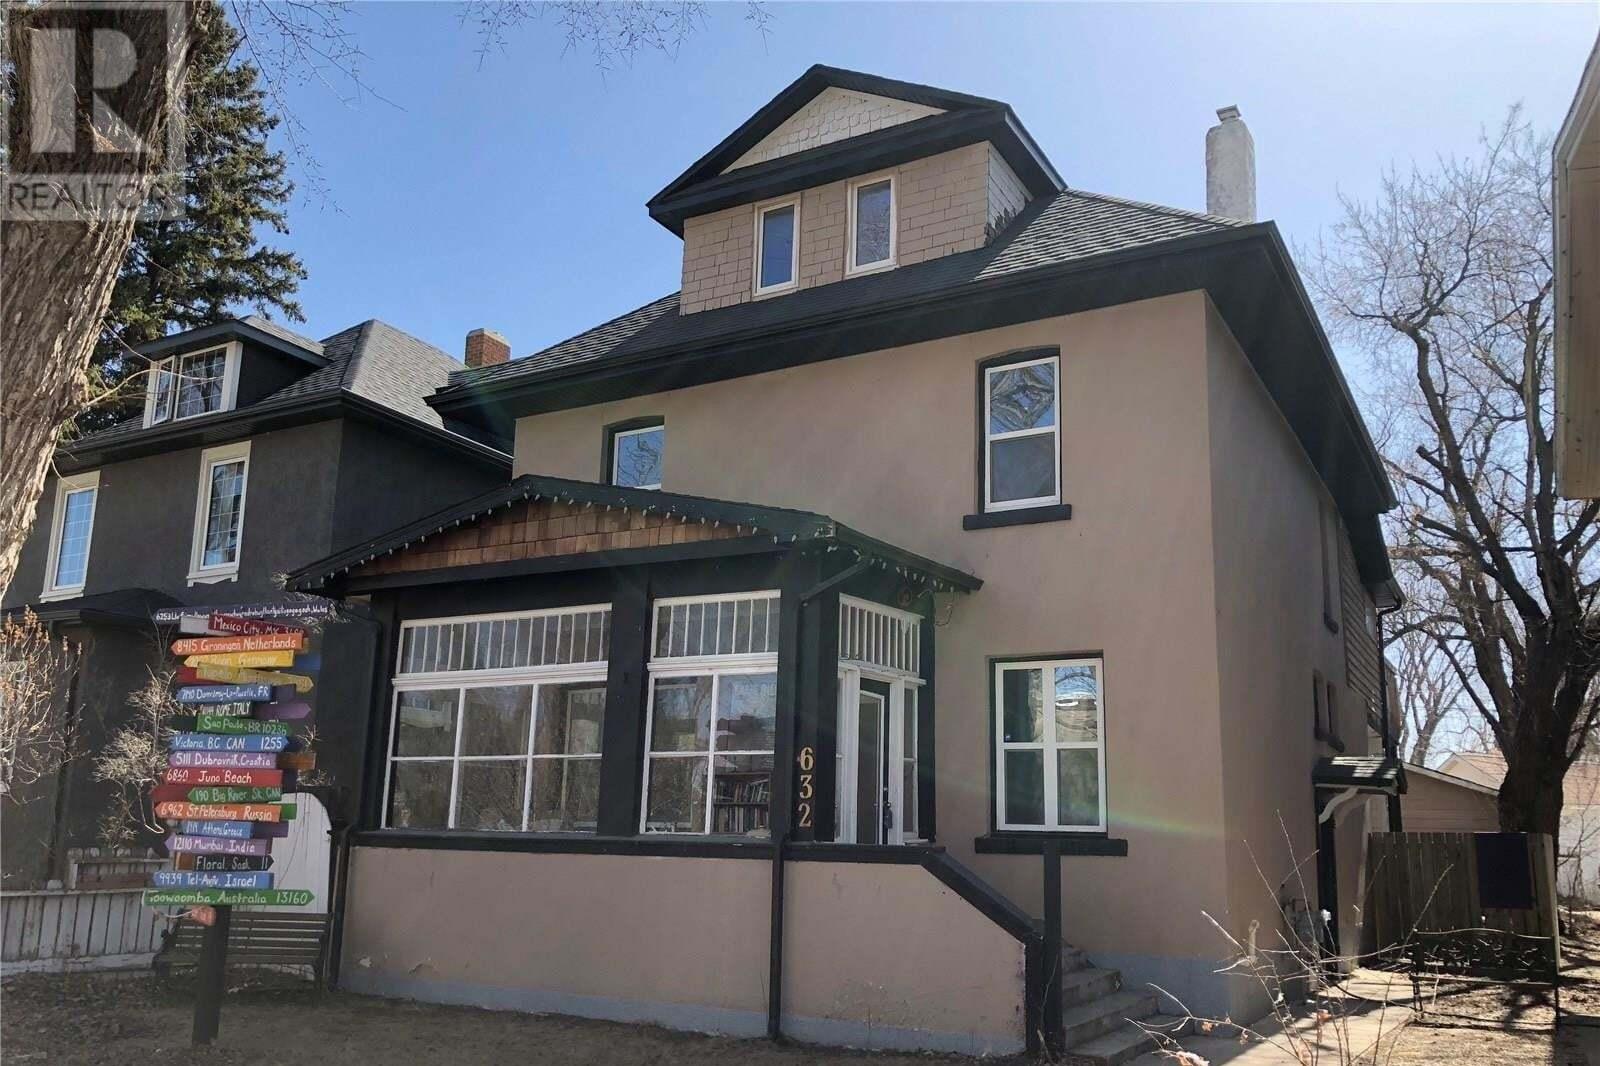 House for sale at 632 University Dr Saskatoon Saskatchewan - MLS: SK826684